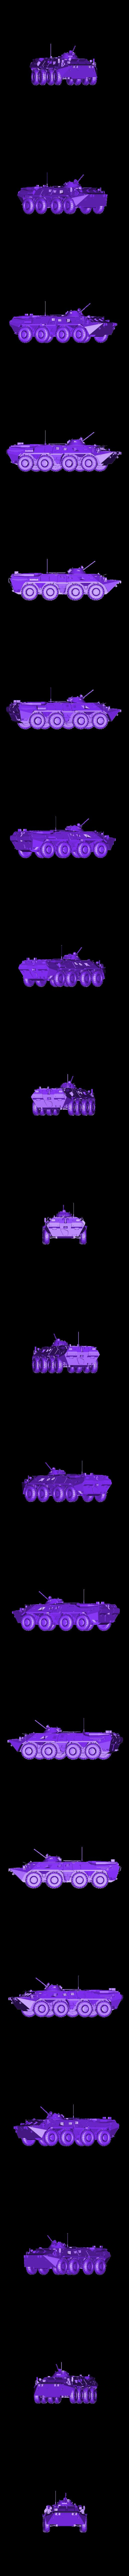 mega tank.stl Download free STL file Mega Tank • 3D printable design, detaildesigner